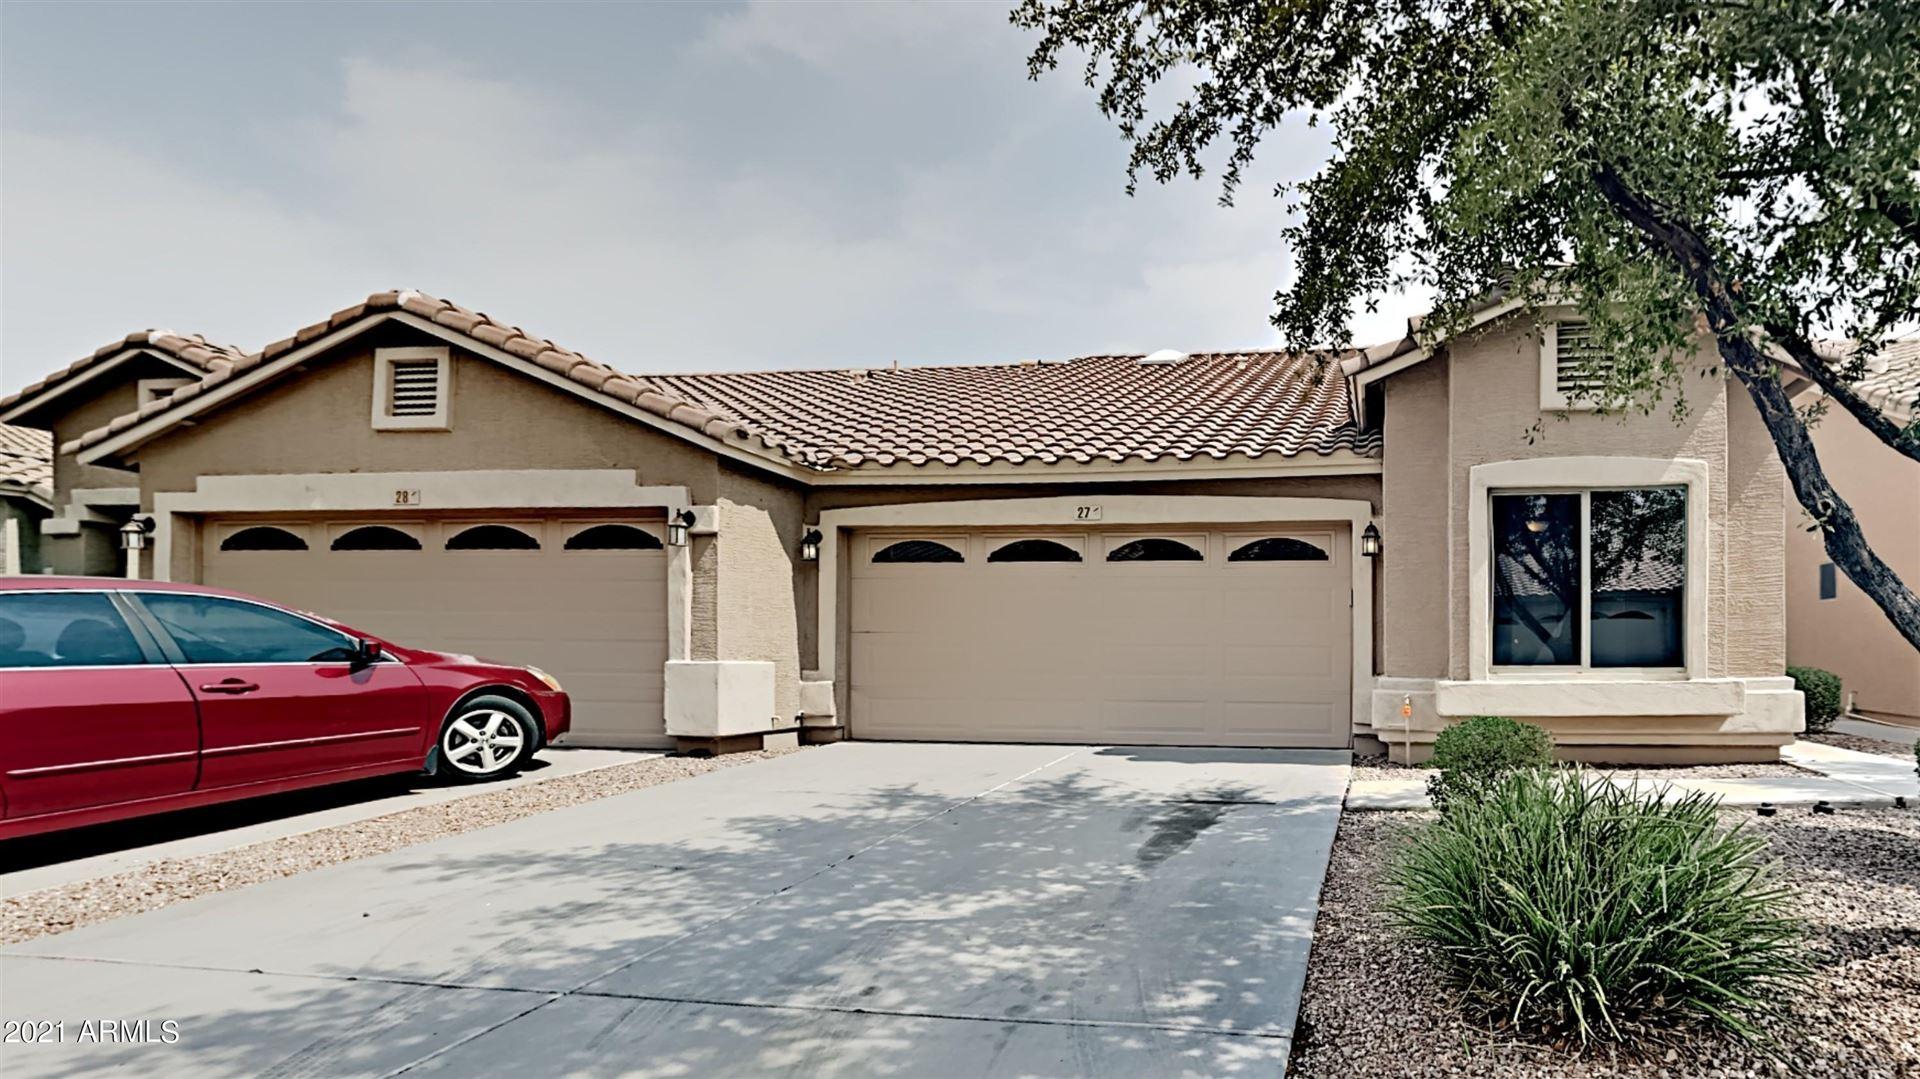 16620 S 48TH Street #27, Phoenix, AZ 85048 - MLS#: 6264358